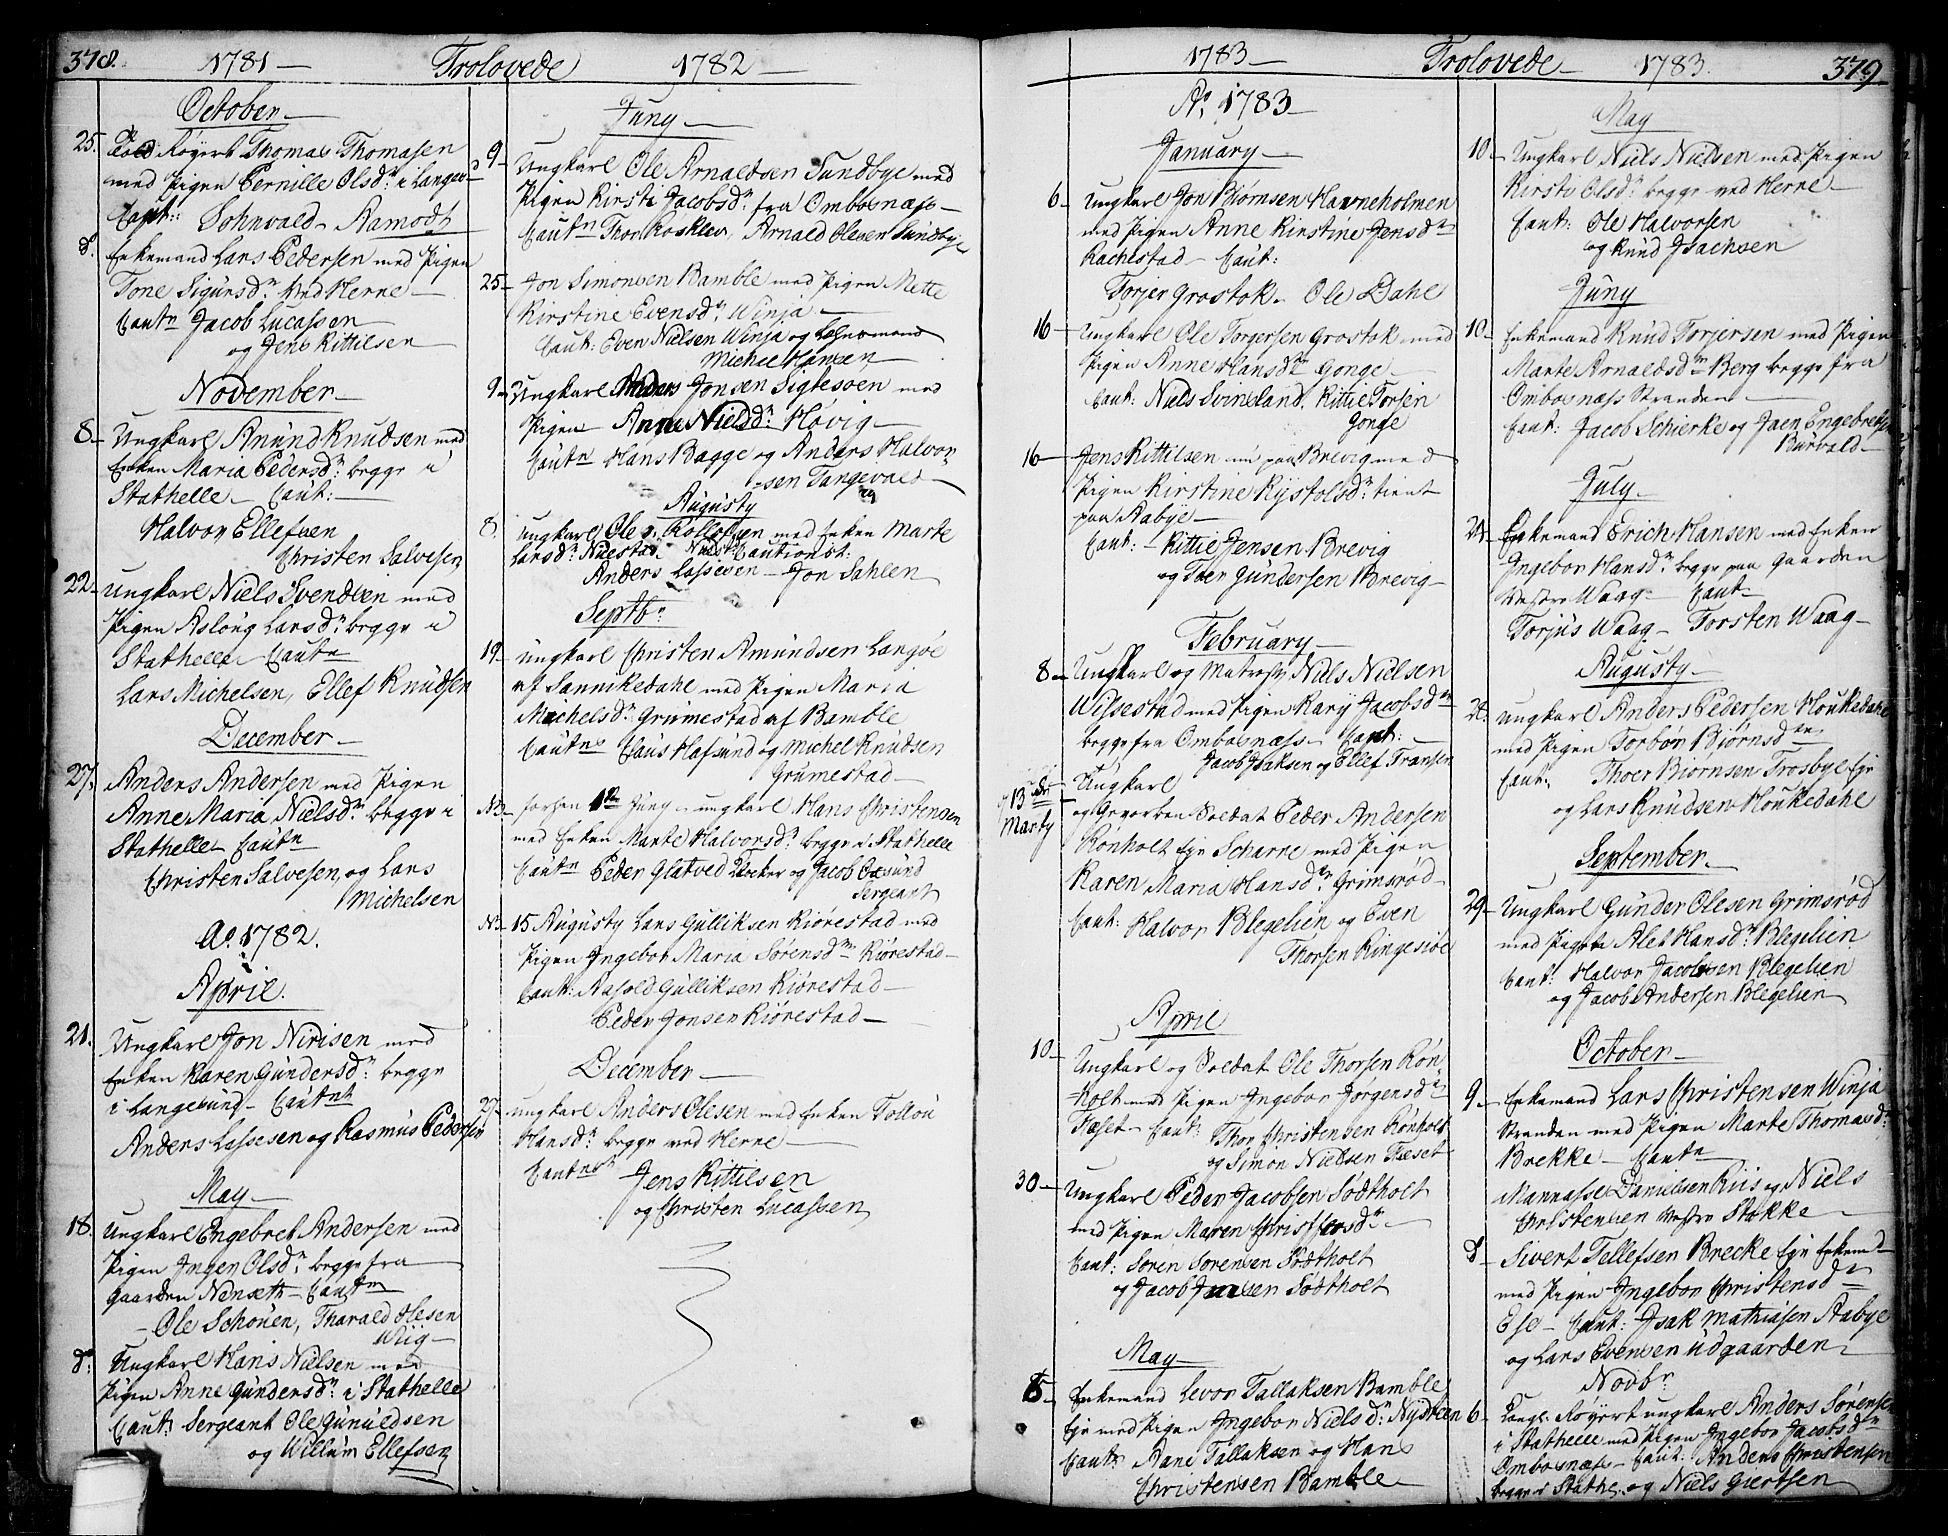 SAKO, Bamble kirkebøker, F/Fa/L0002: Ministerialbok nr. I 2, 1775-1814, s. 378-379